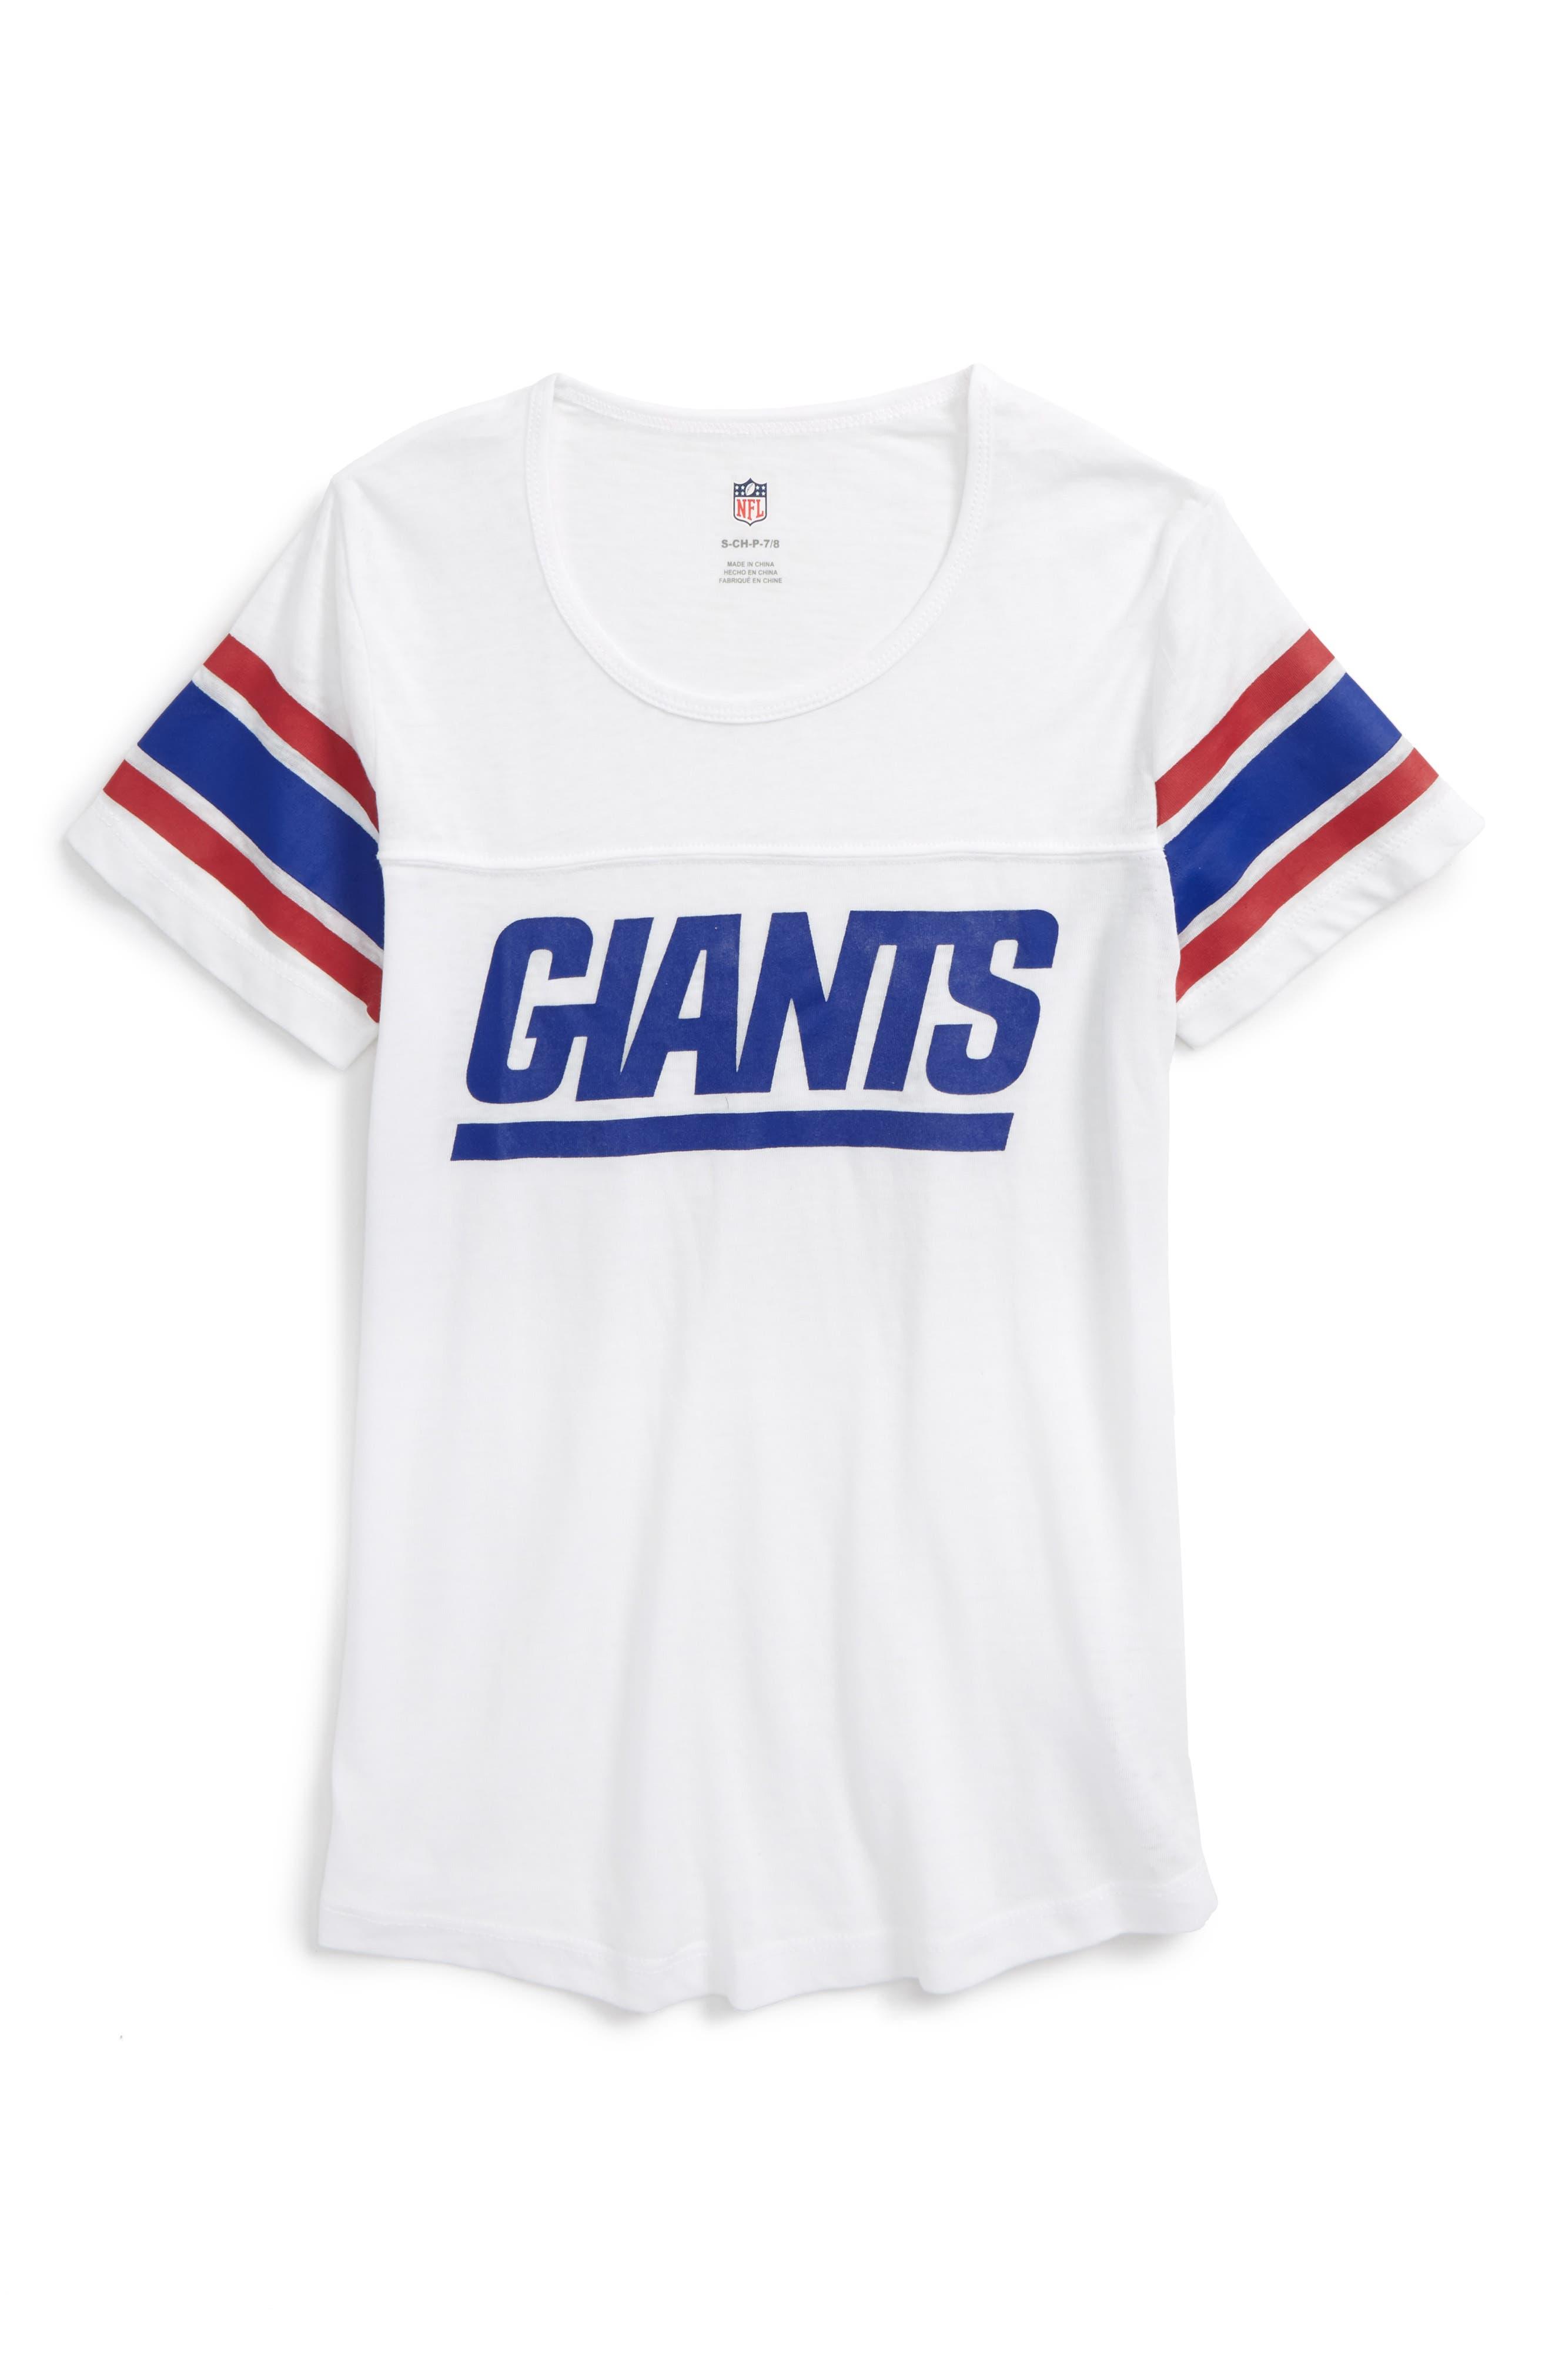 Main Image - Outerstuff NFL New York Giants Team Pride Tee (Big Girls)